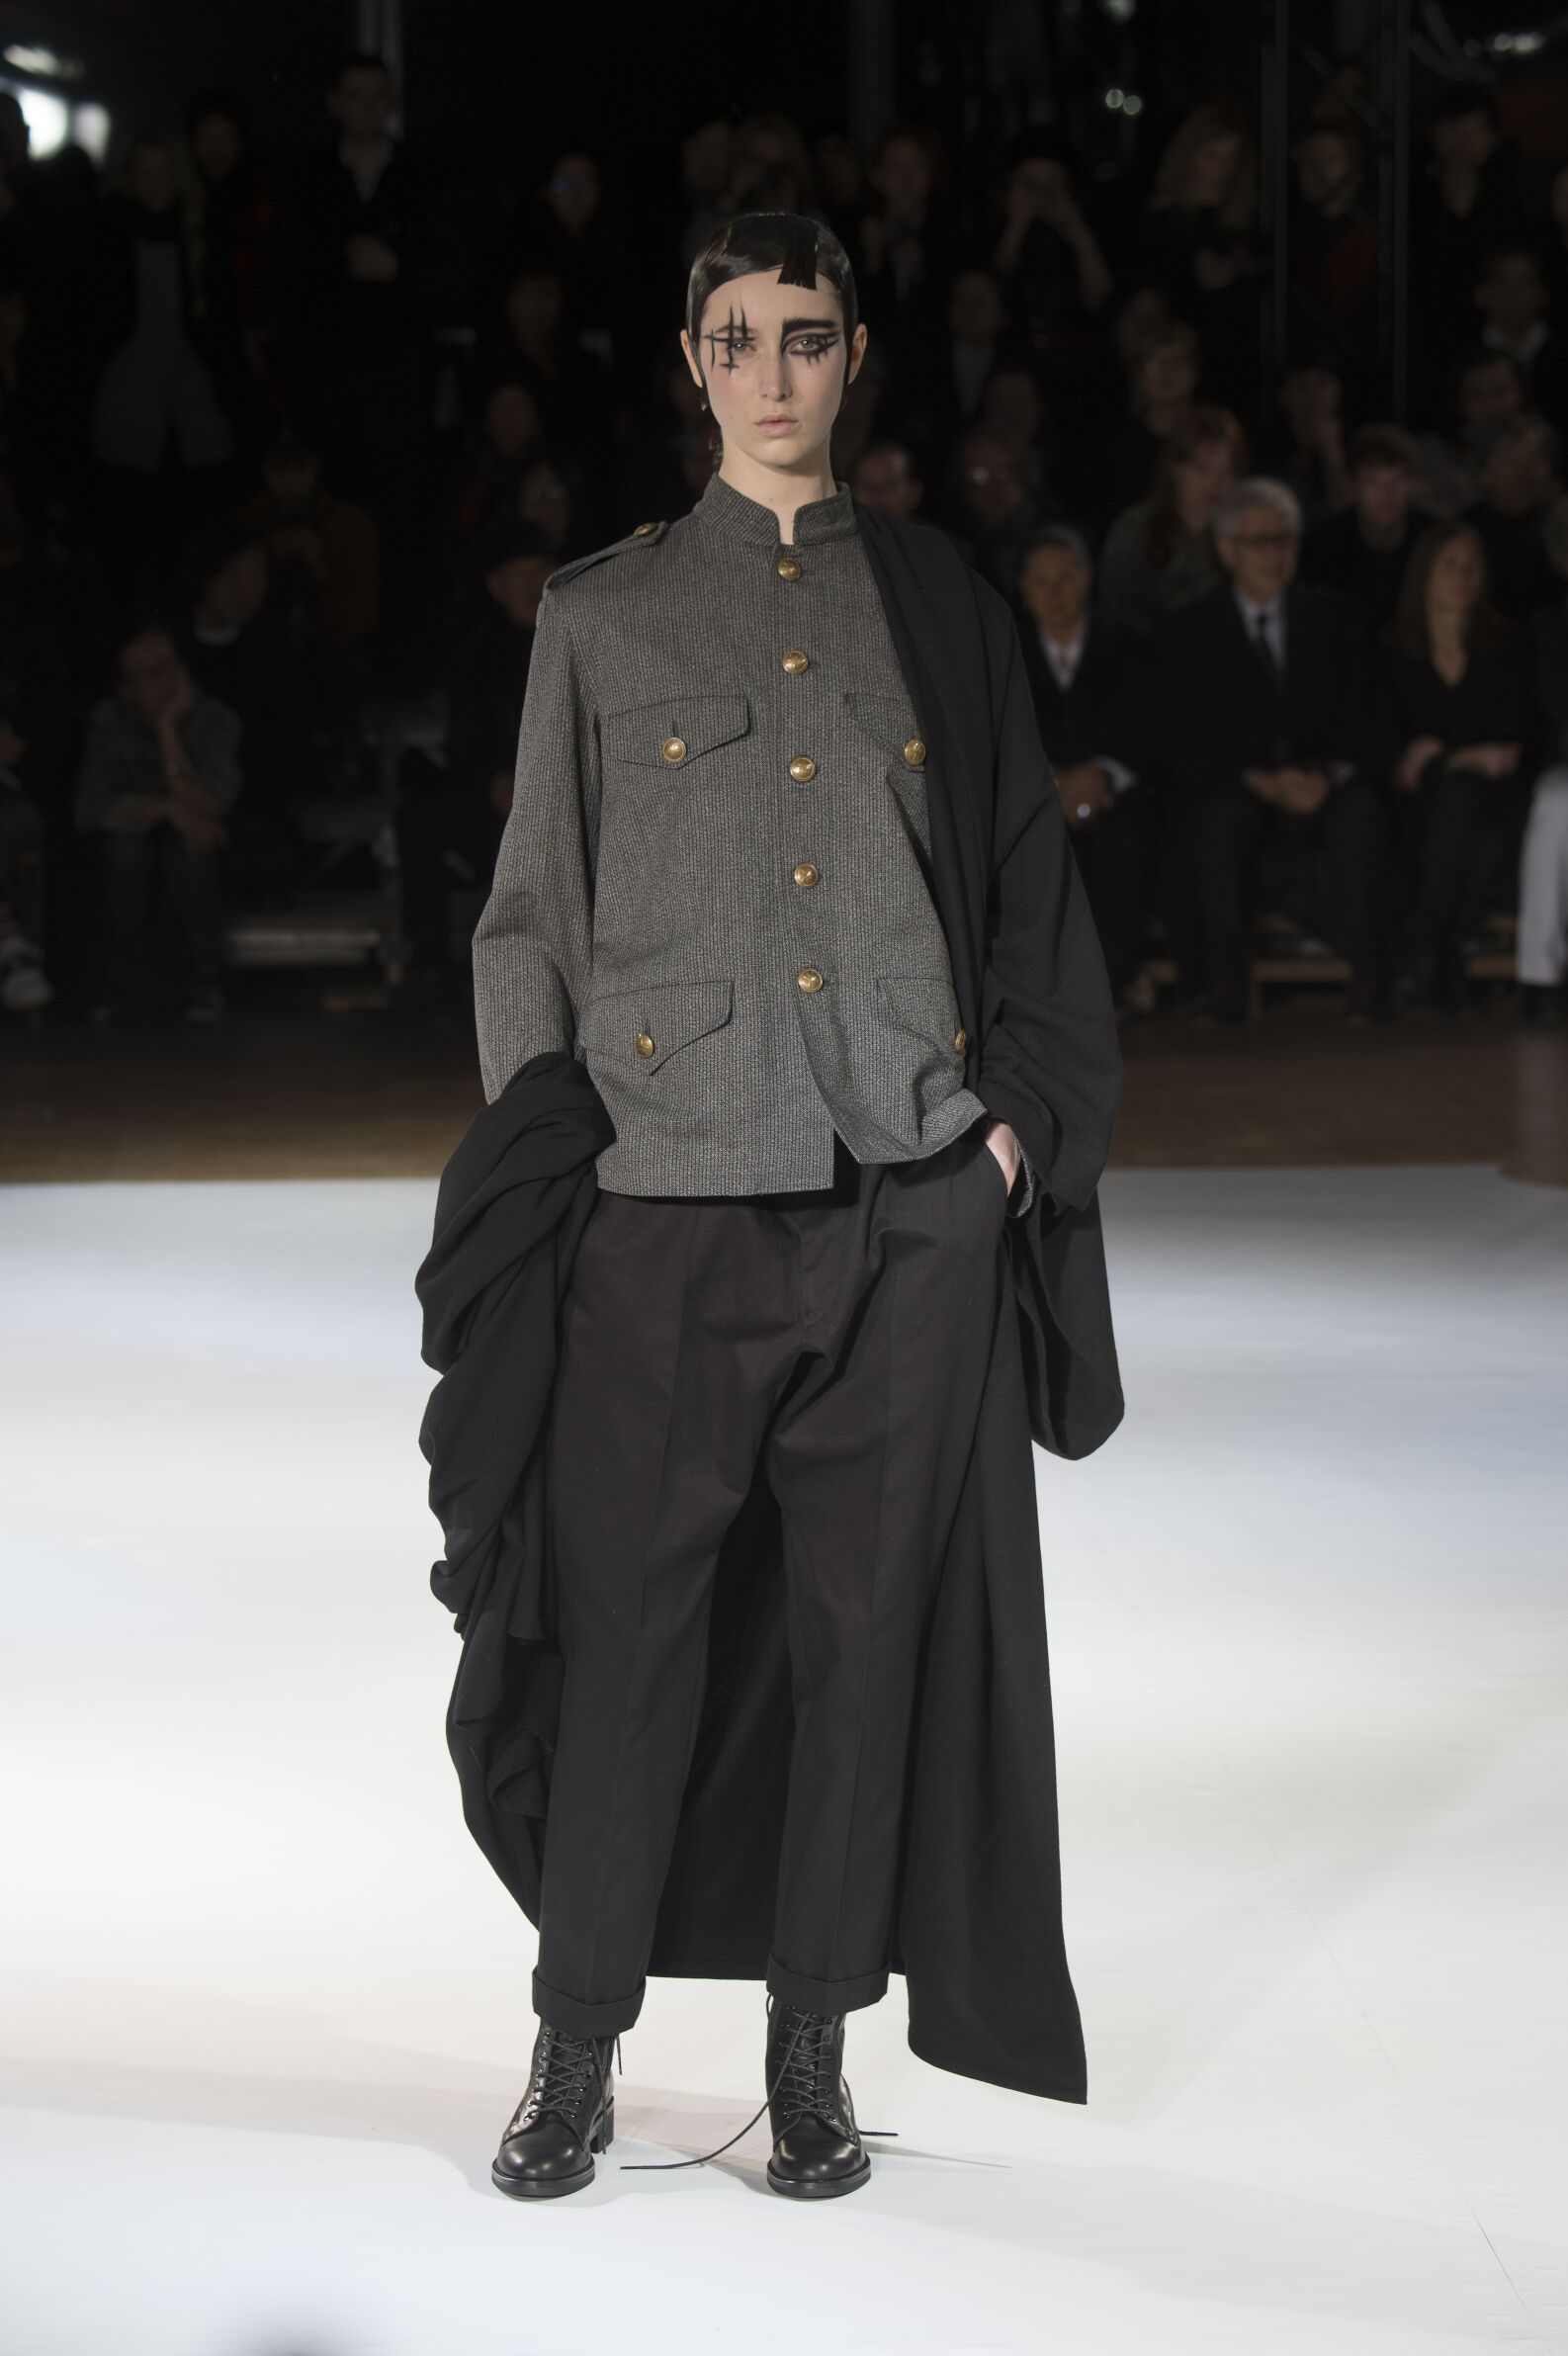 Fashion Winter Trends 2015 2016 Yohji Yamamoto